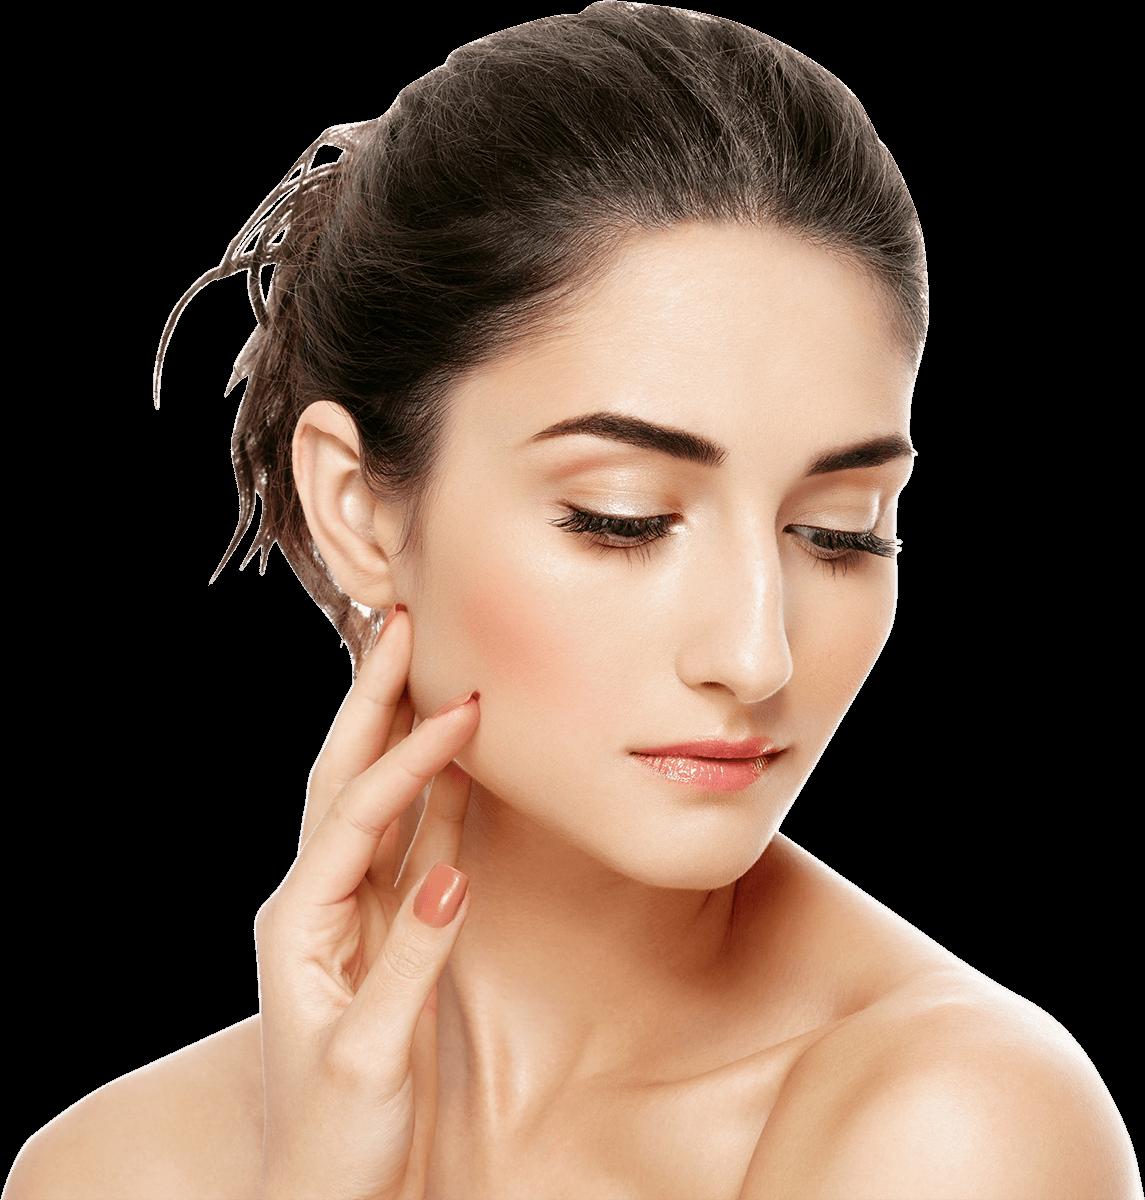 Clinical Skincare model 01